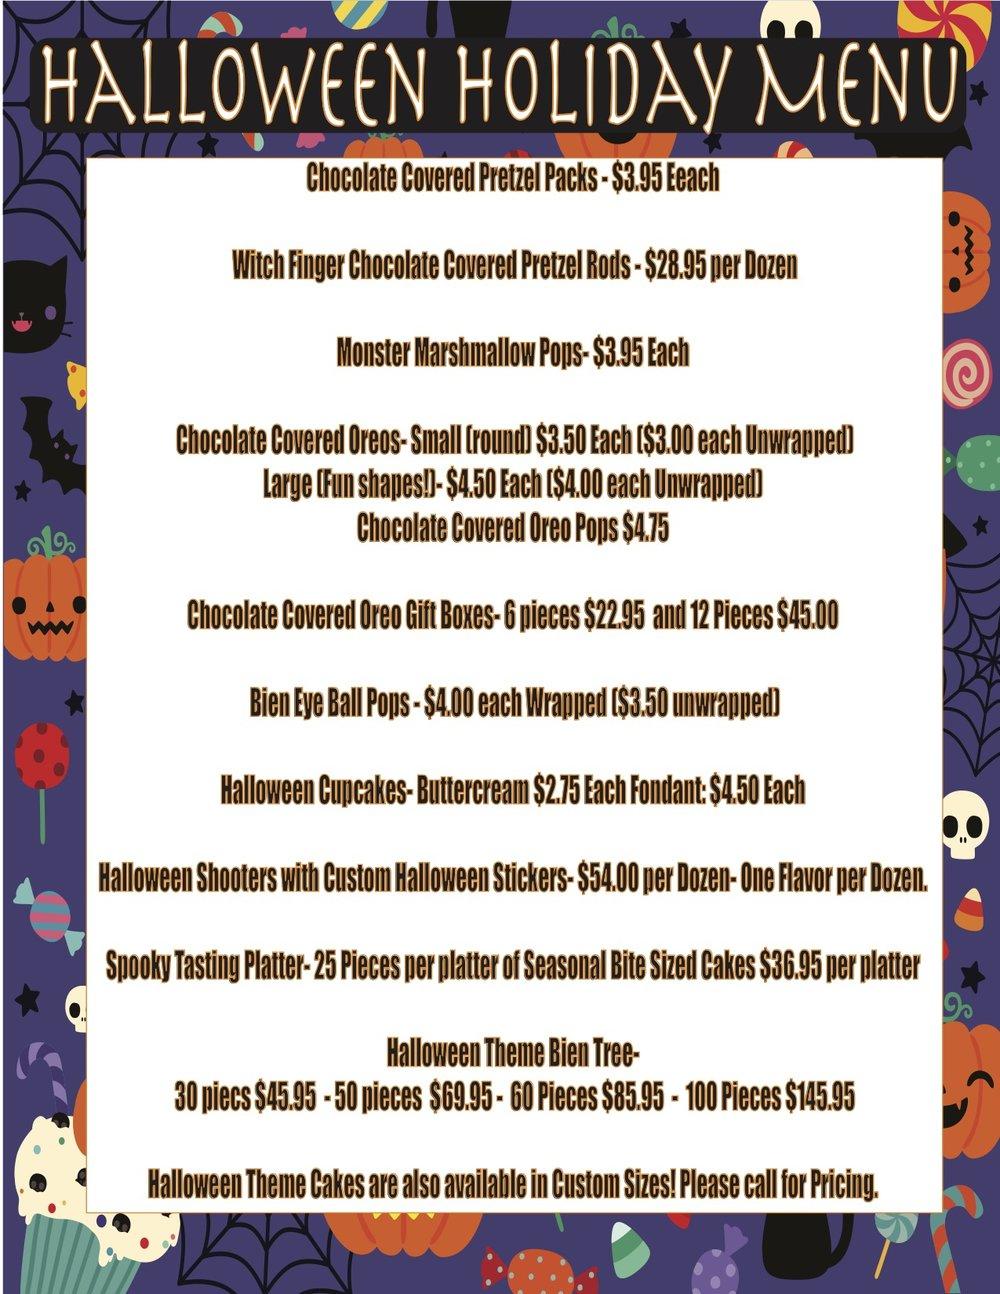 HalloweenHolidayMenu2018 .jpg